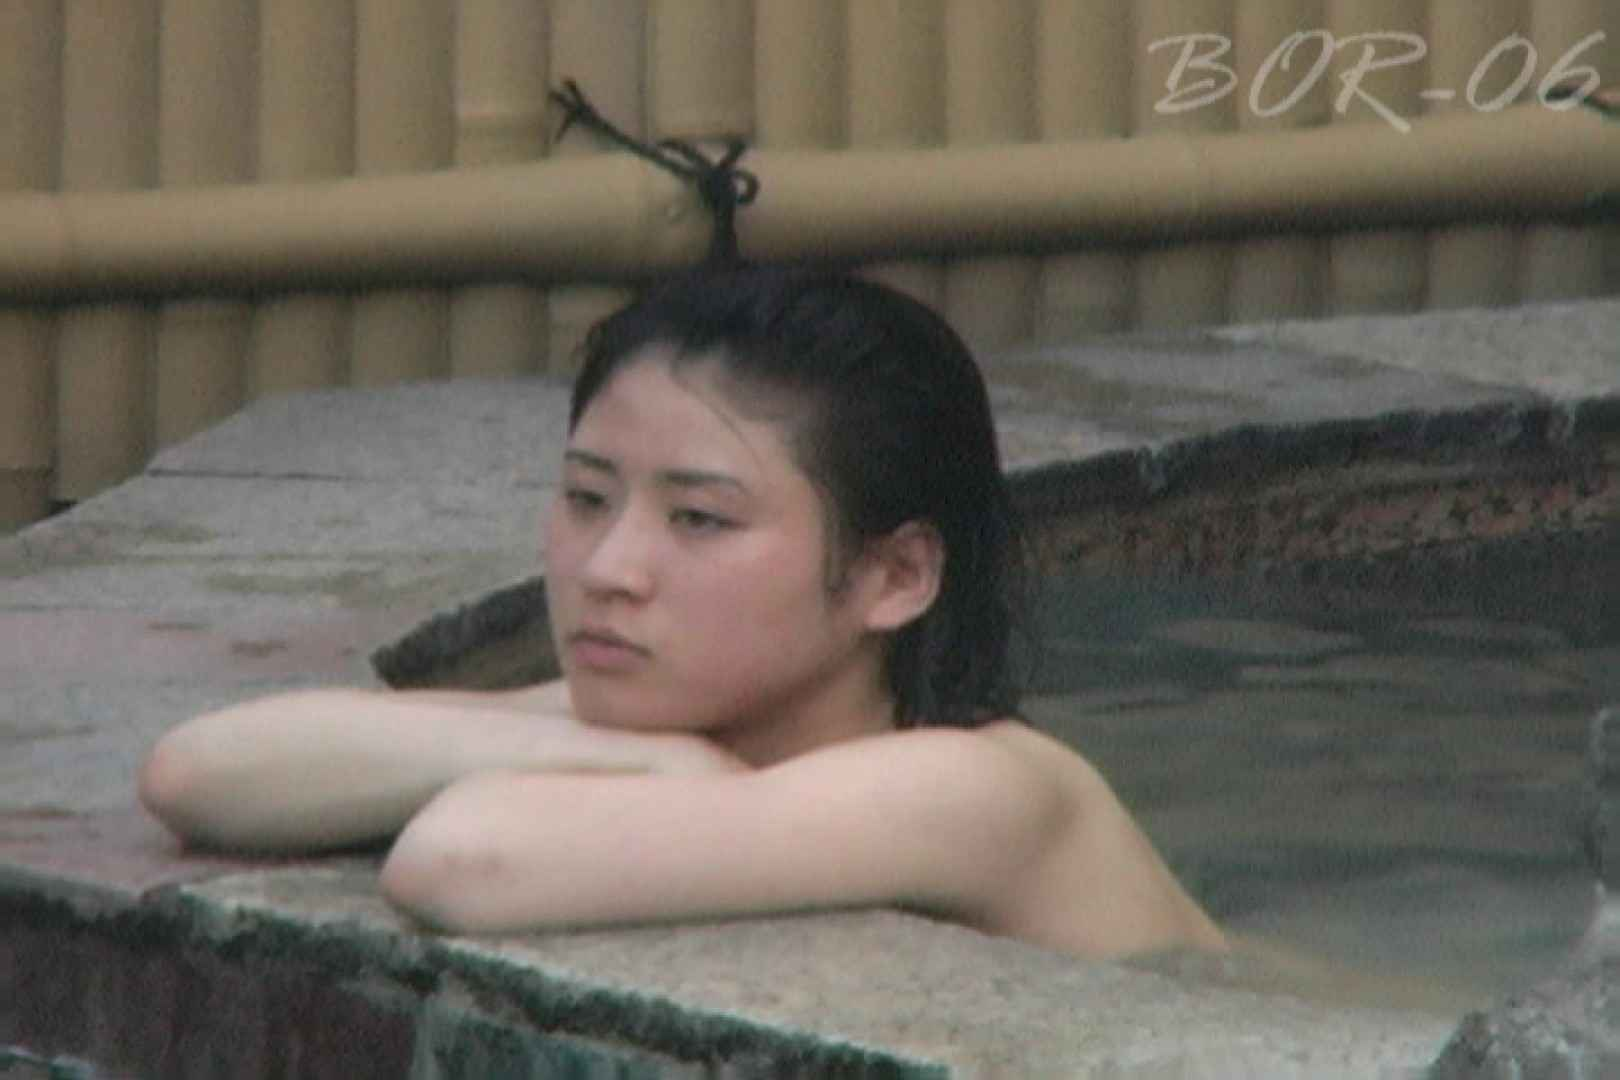 Aquaな露天風呂Vol.520 OL女体  52連発 24